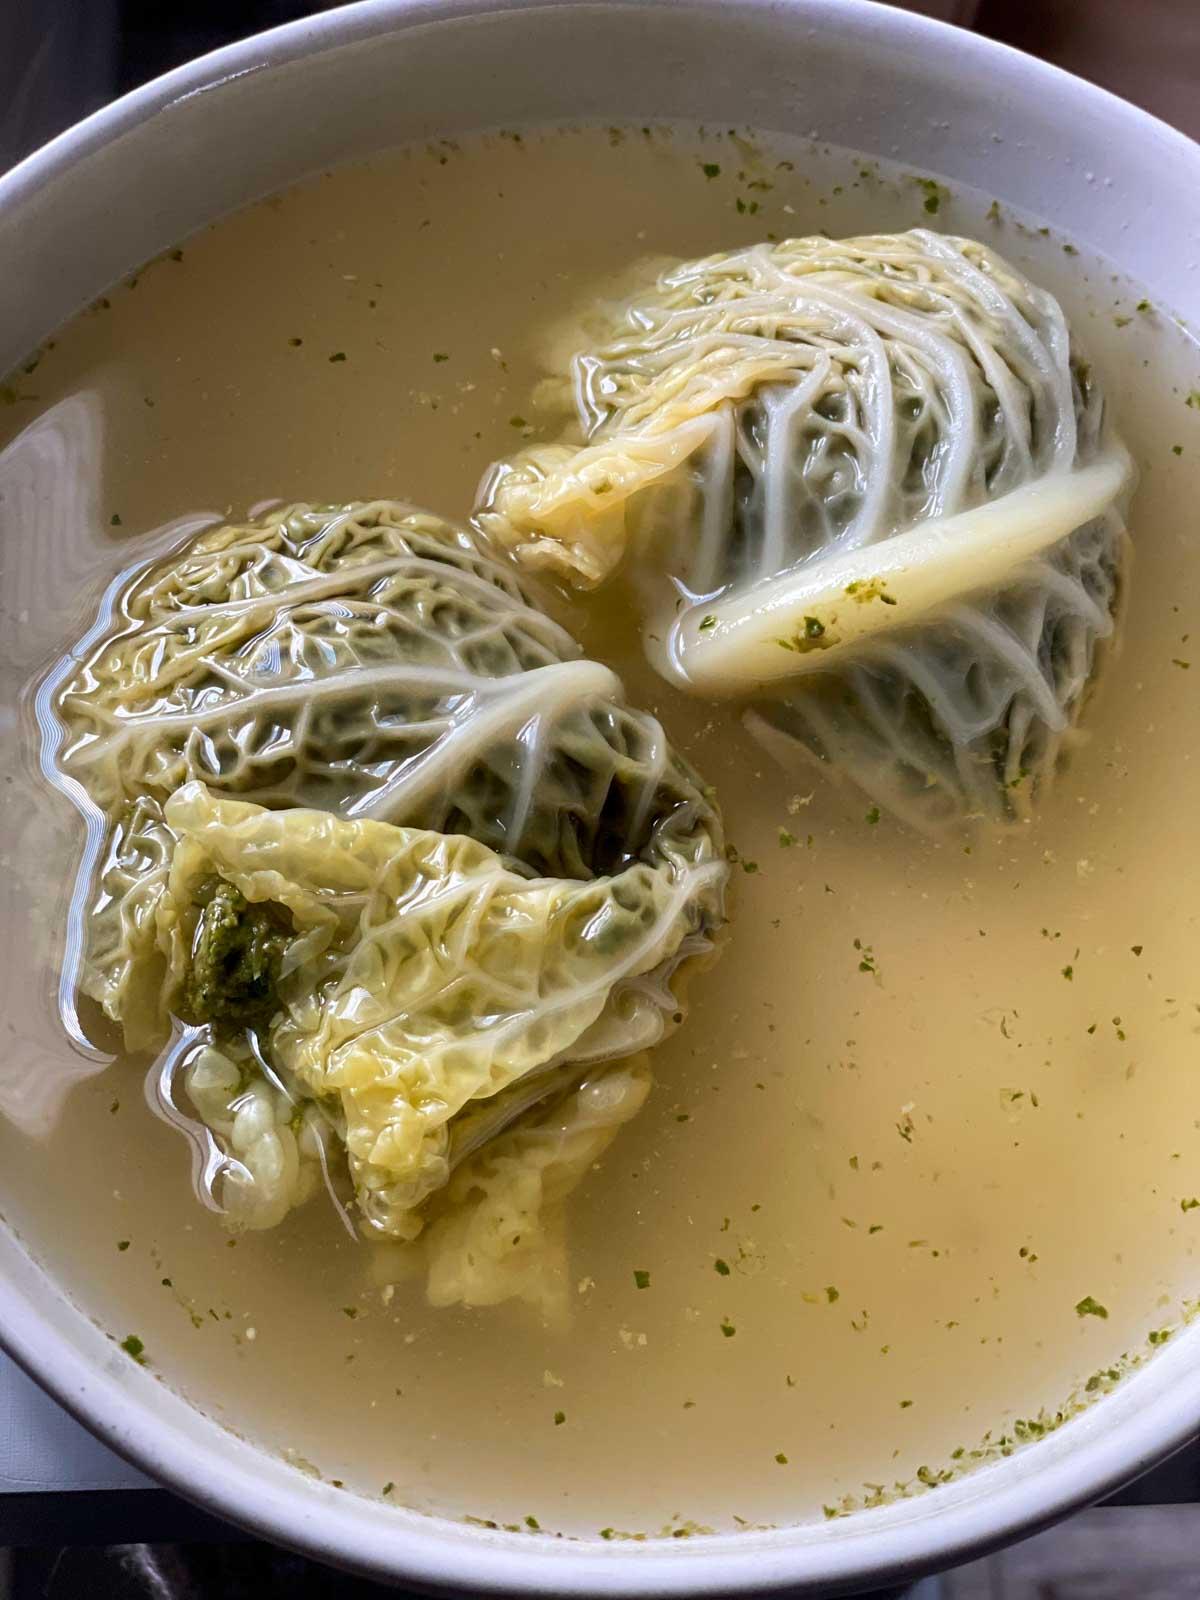 sakara level ii day 1 lunch, cabbage dumplings in galangal broth